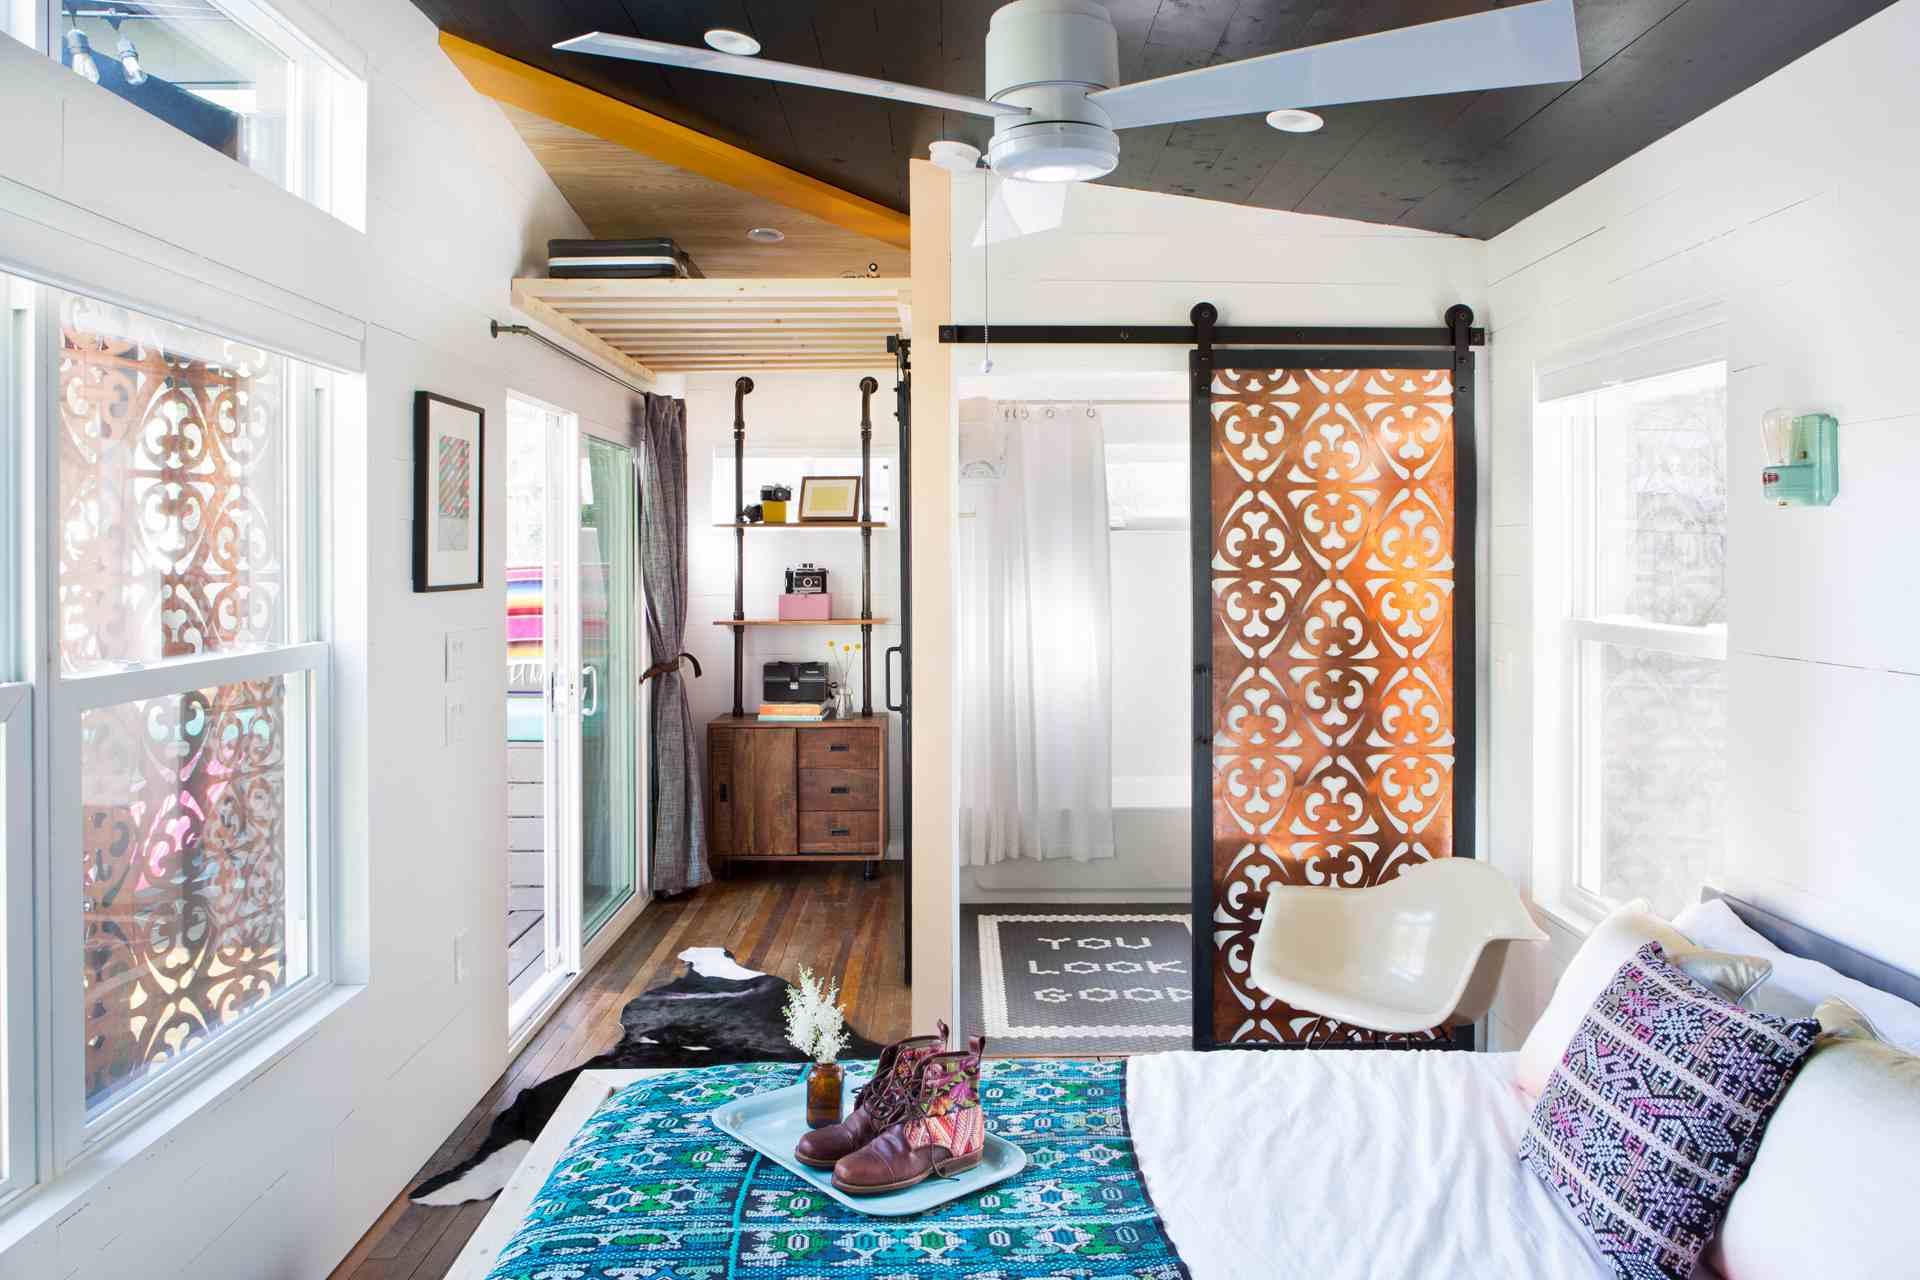 sala de estilo bohemio con alfombras múltiples